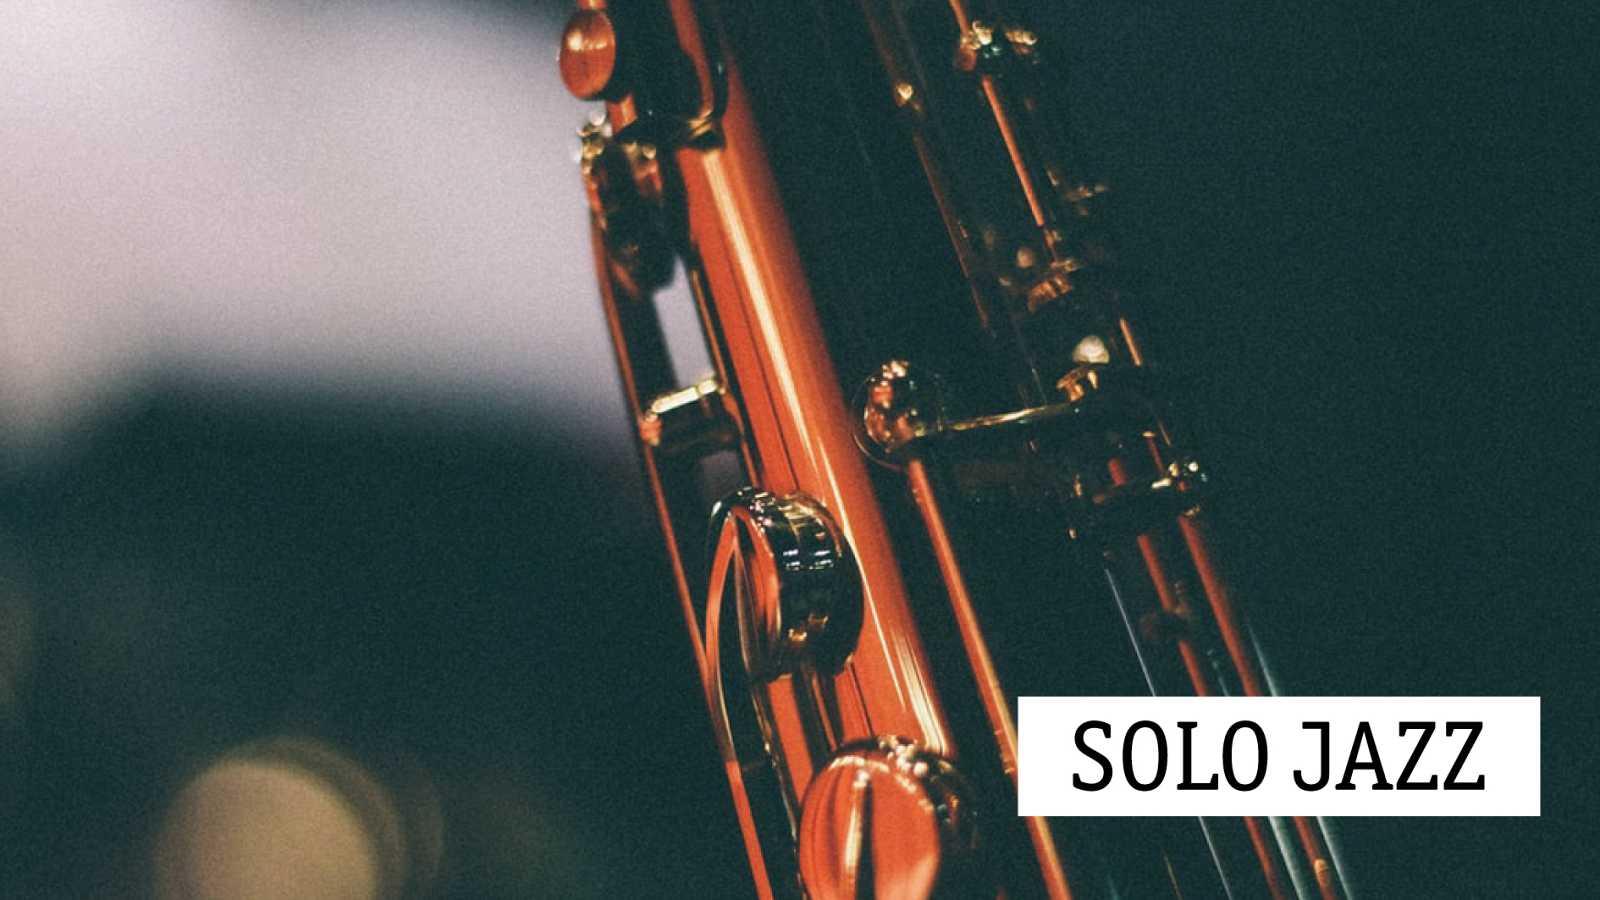 Solo jazz - Escuchar jazz hoy - 02/12/20 - escuchar ahora